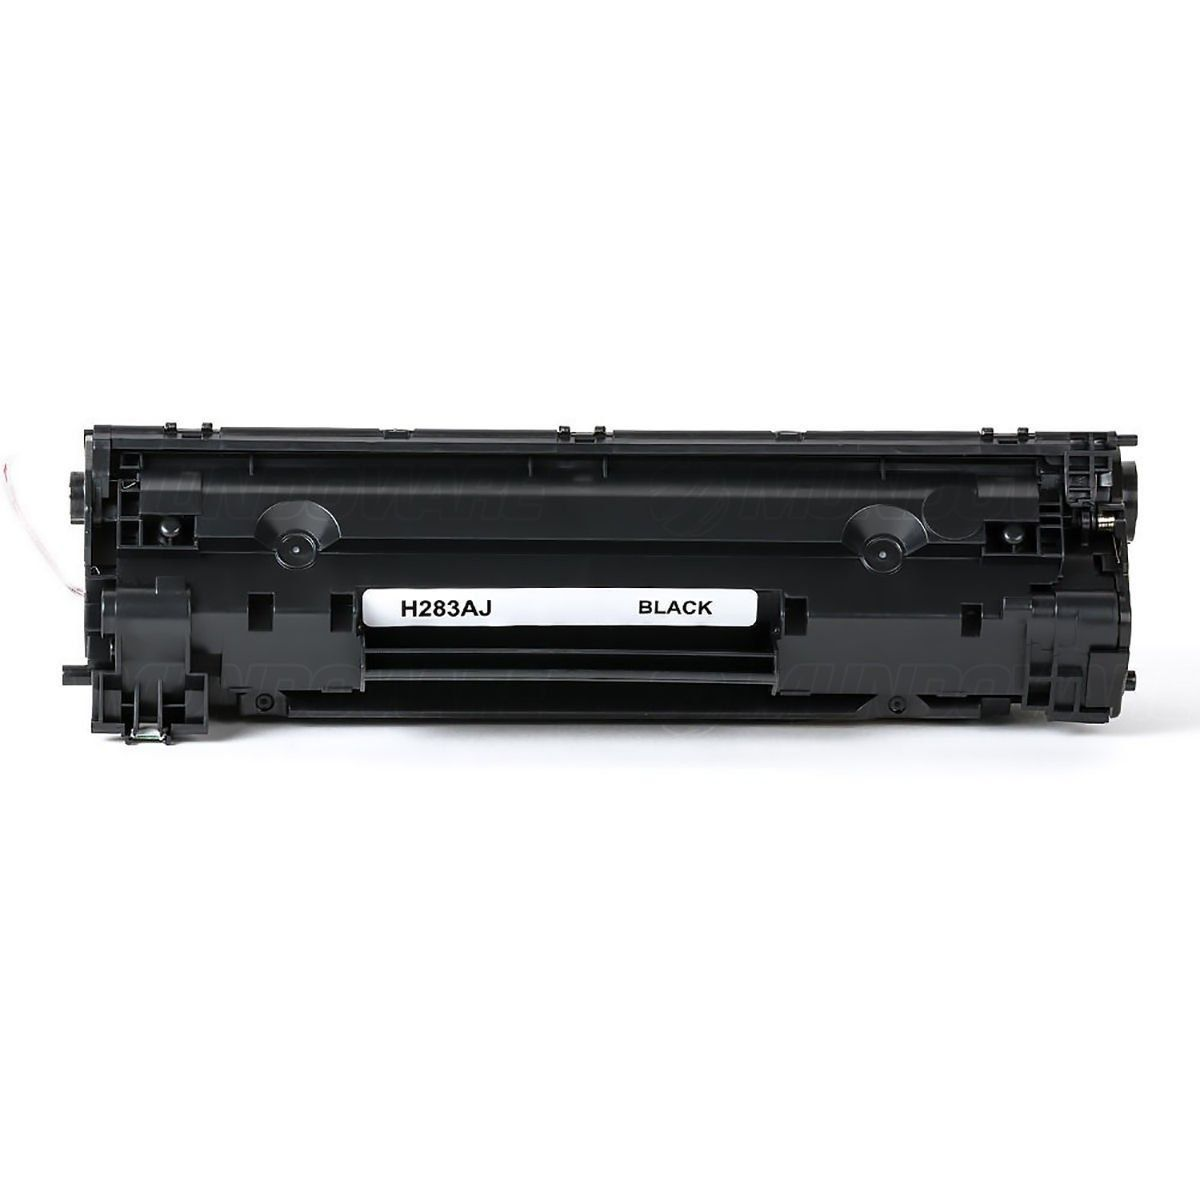 Compatível: Toner CF283X 283X 83X para HP M201n M201dw M225dn M225dw M226 M127fw M128fn / Preto / 2.500